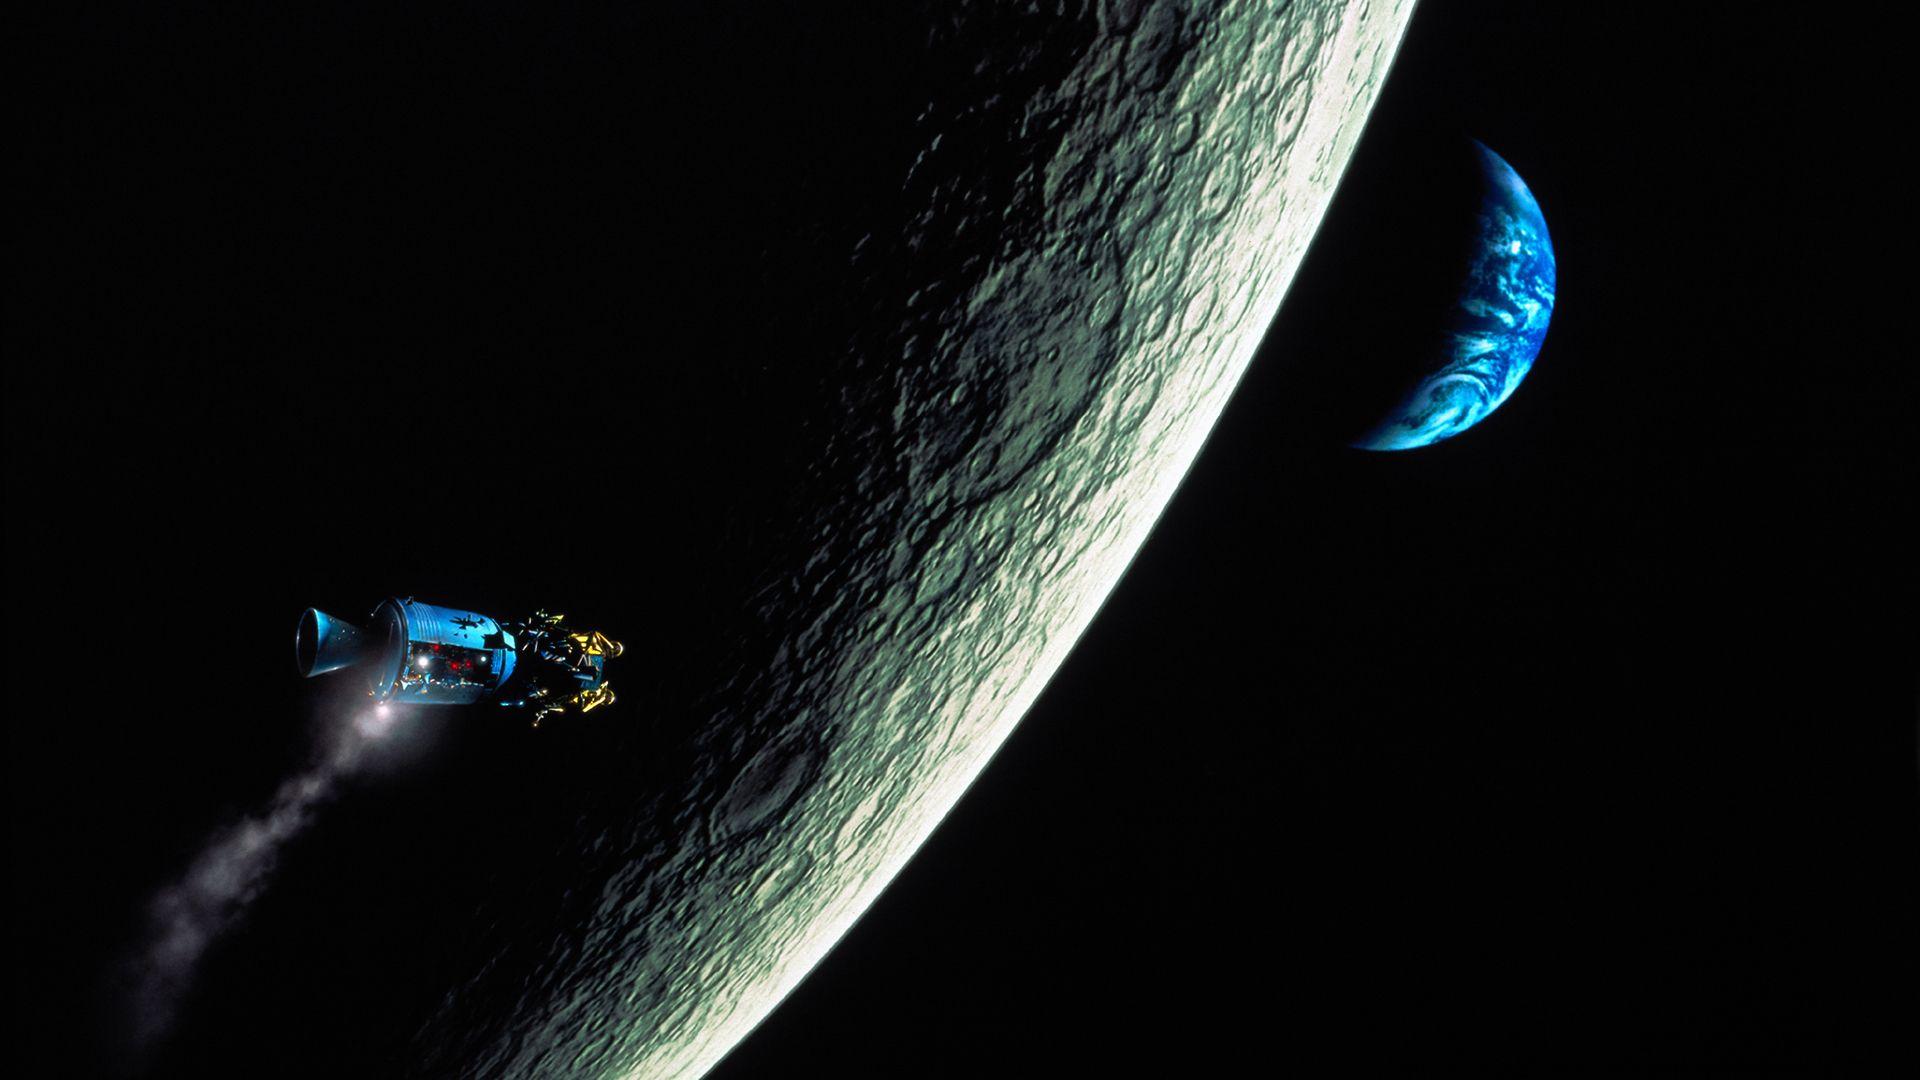 Apollo 13 images pictures